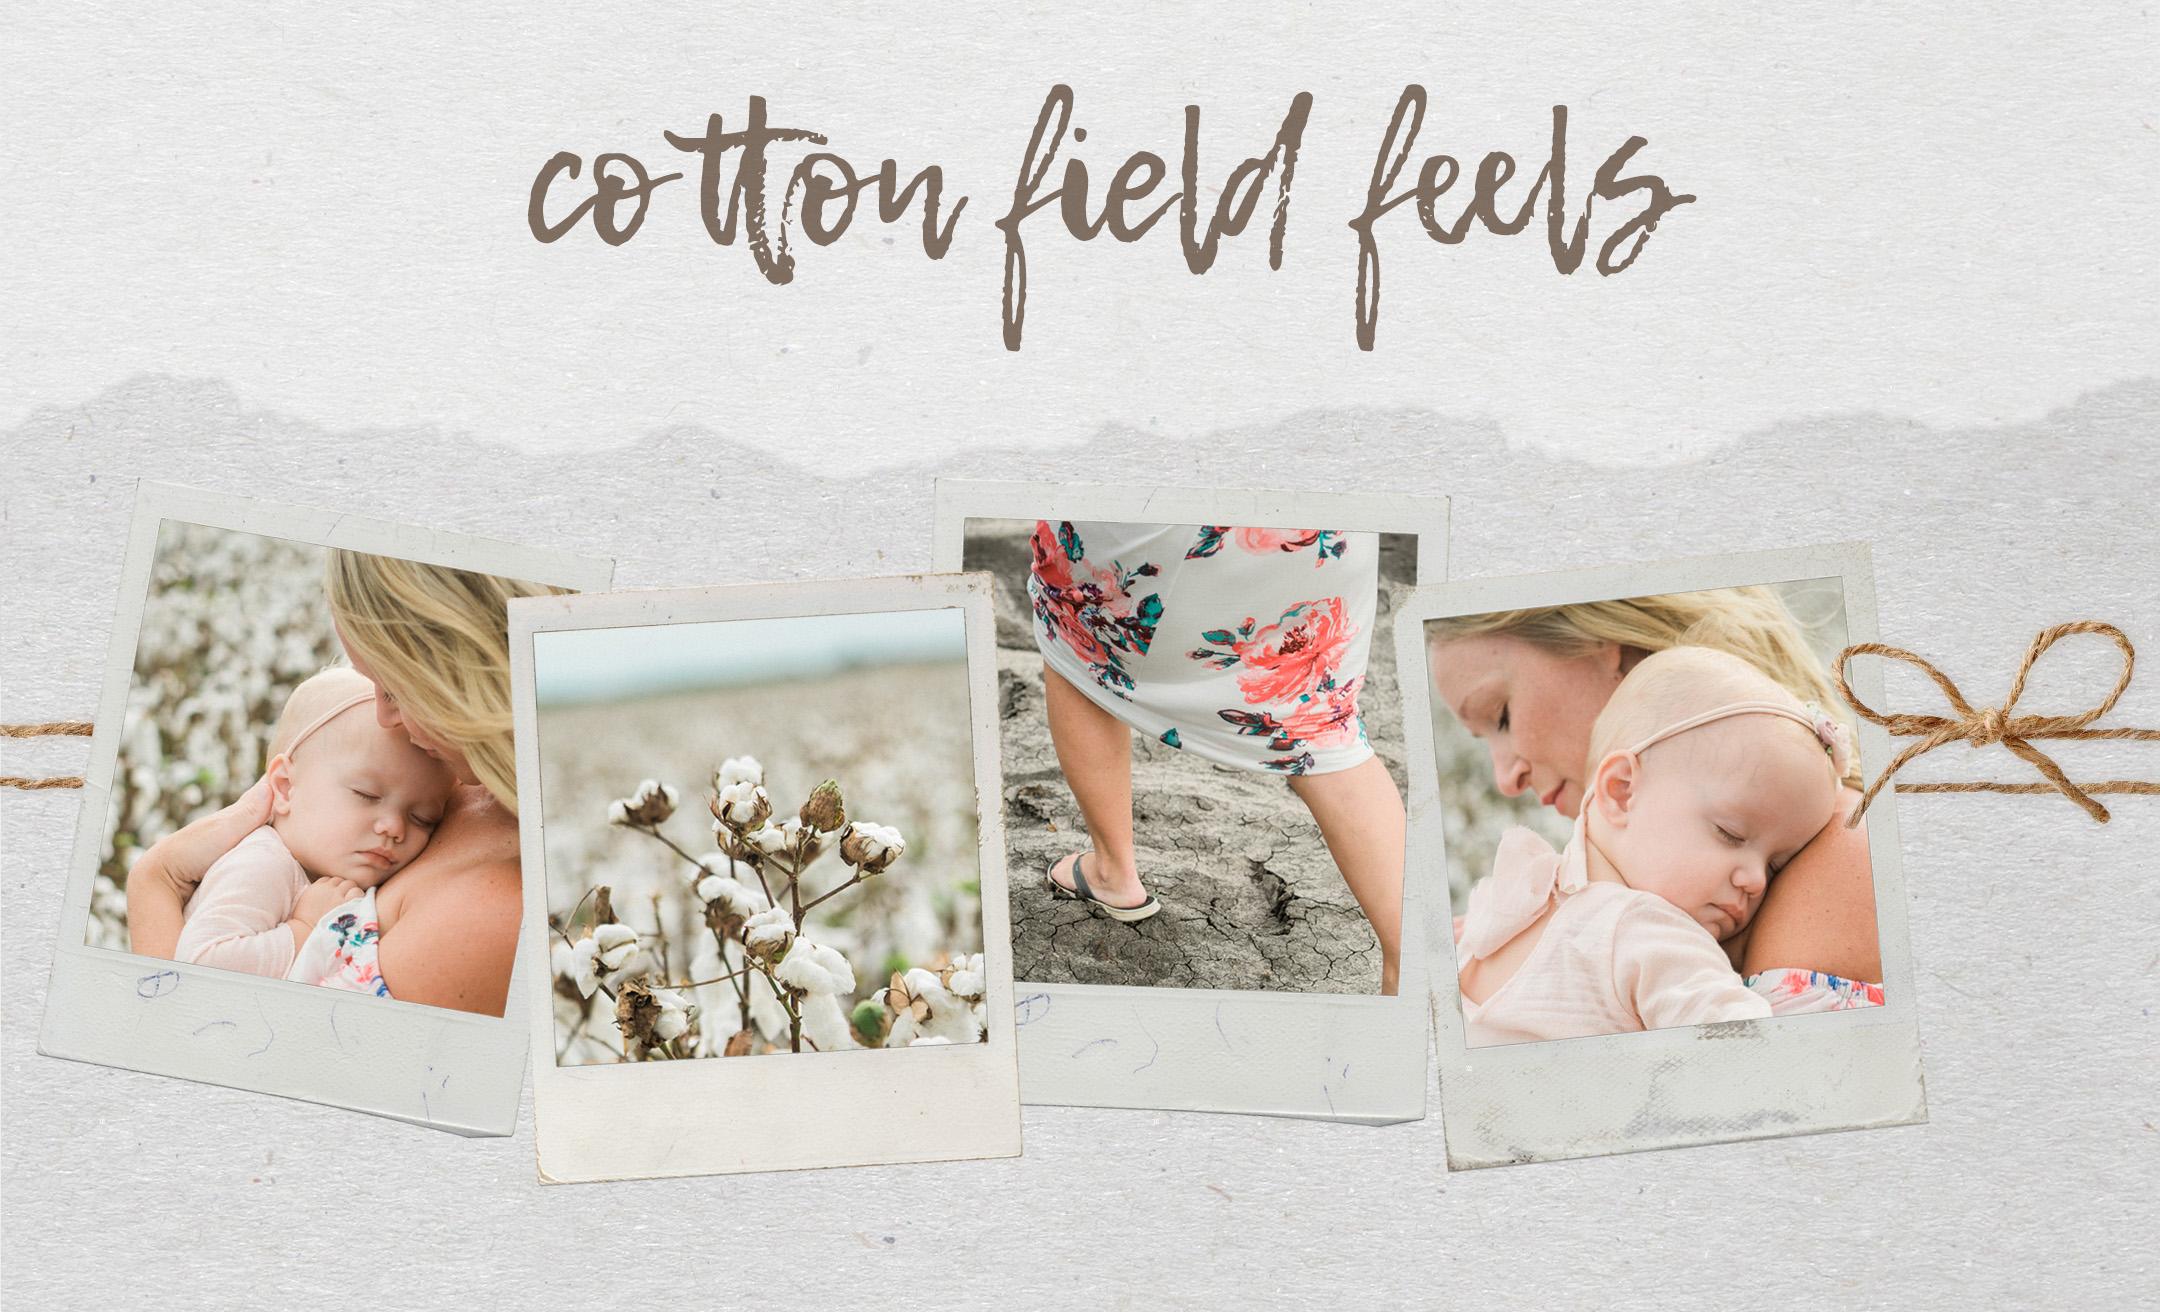 san-antonio-cotton-field-collage.jpg